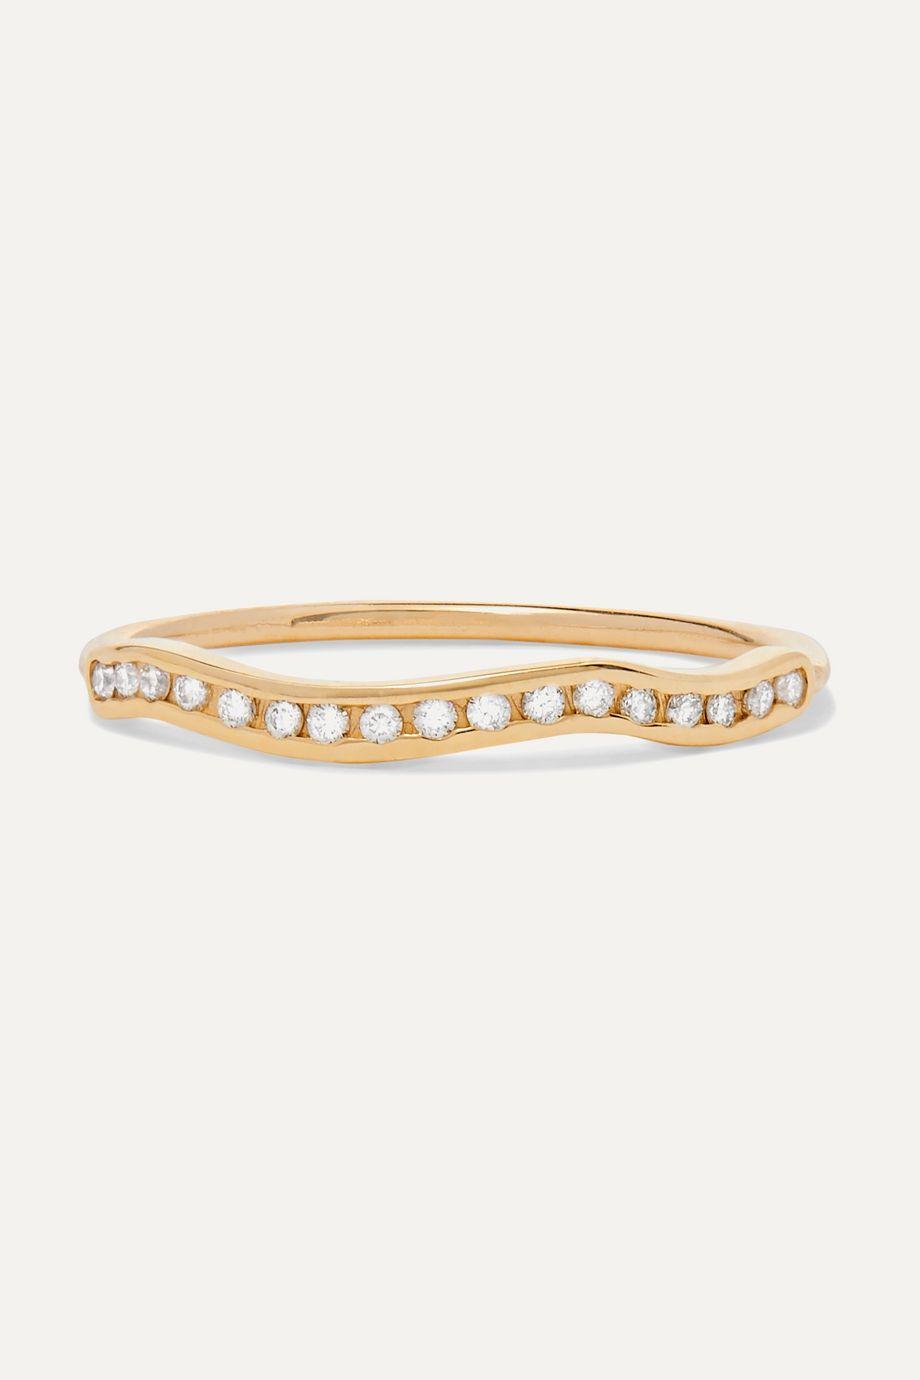 SARAH & SEBASTIAN Kintsugi Line gold diamond ring